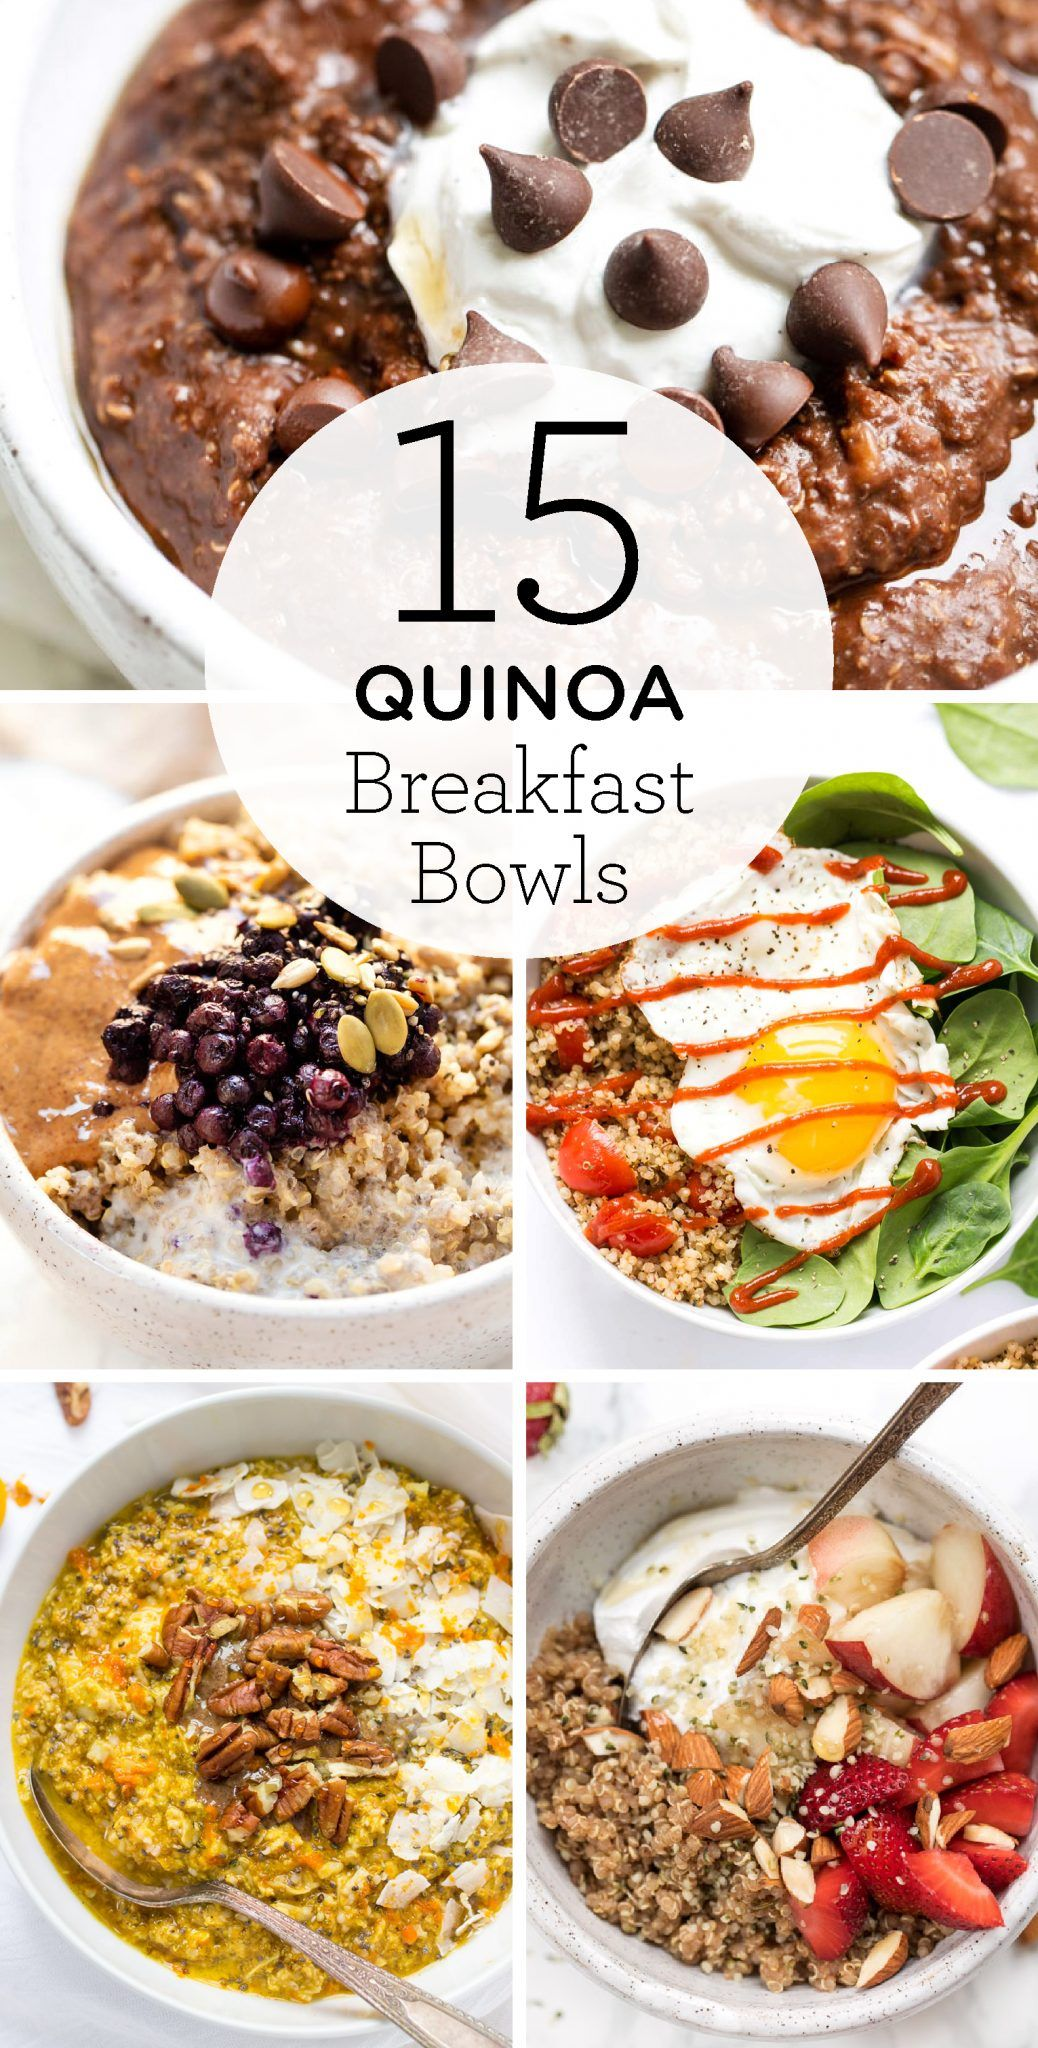 15 Best Quinoa Breakfast Bowls images